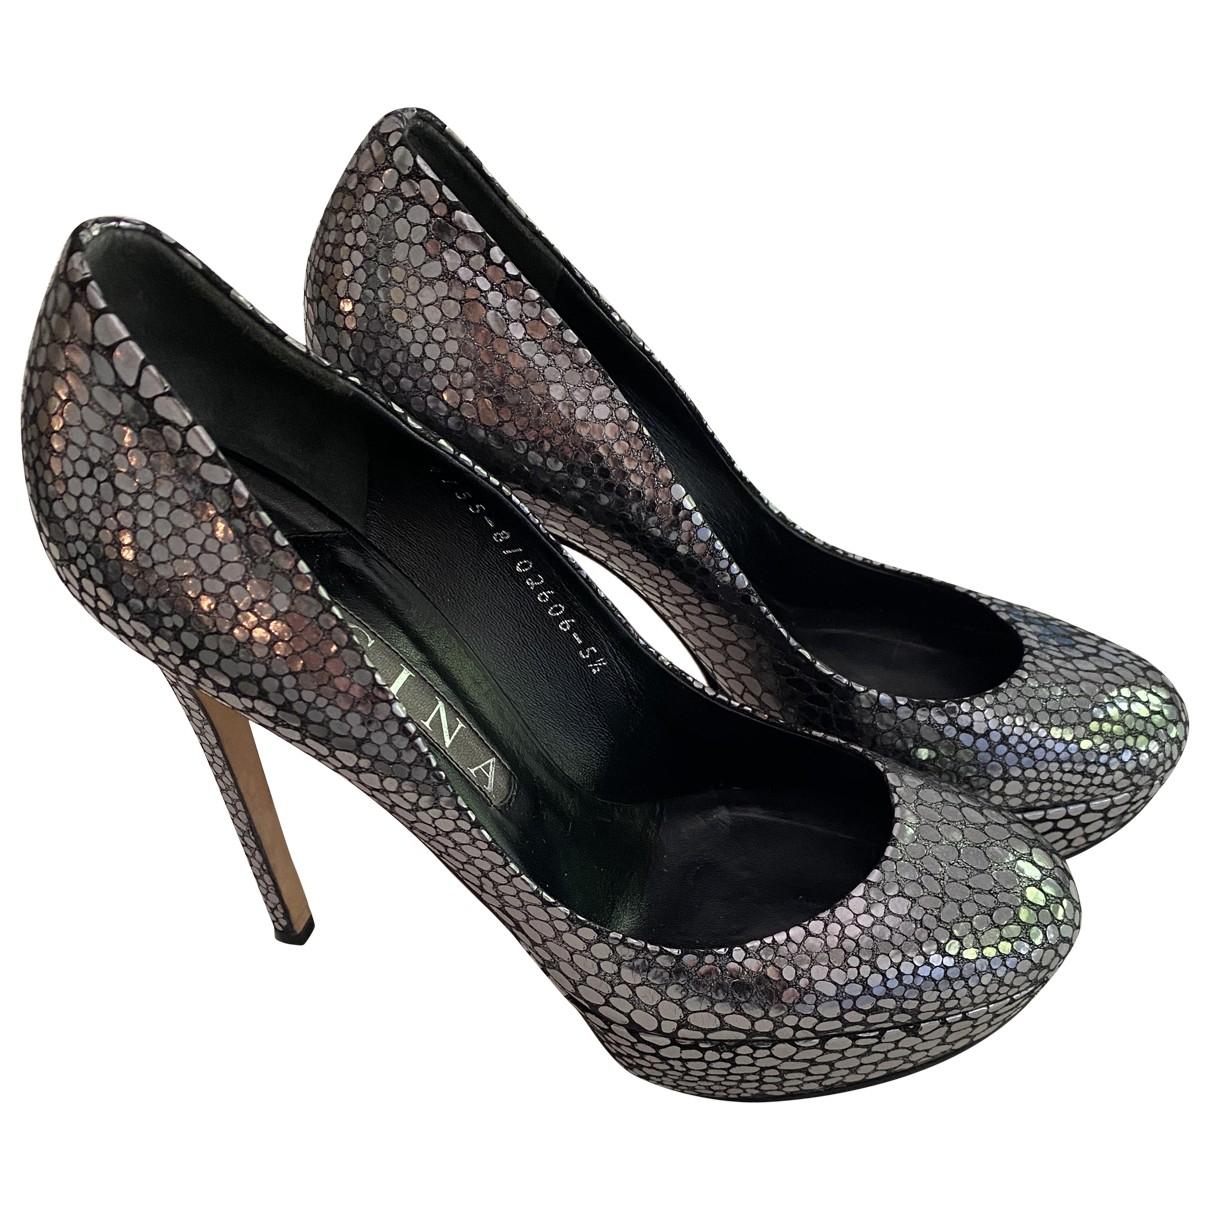 Gina \N Metallic Leather Heels for Women 5.5 UK